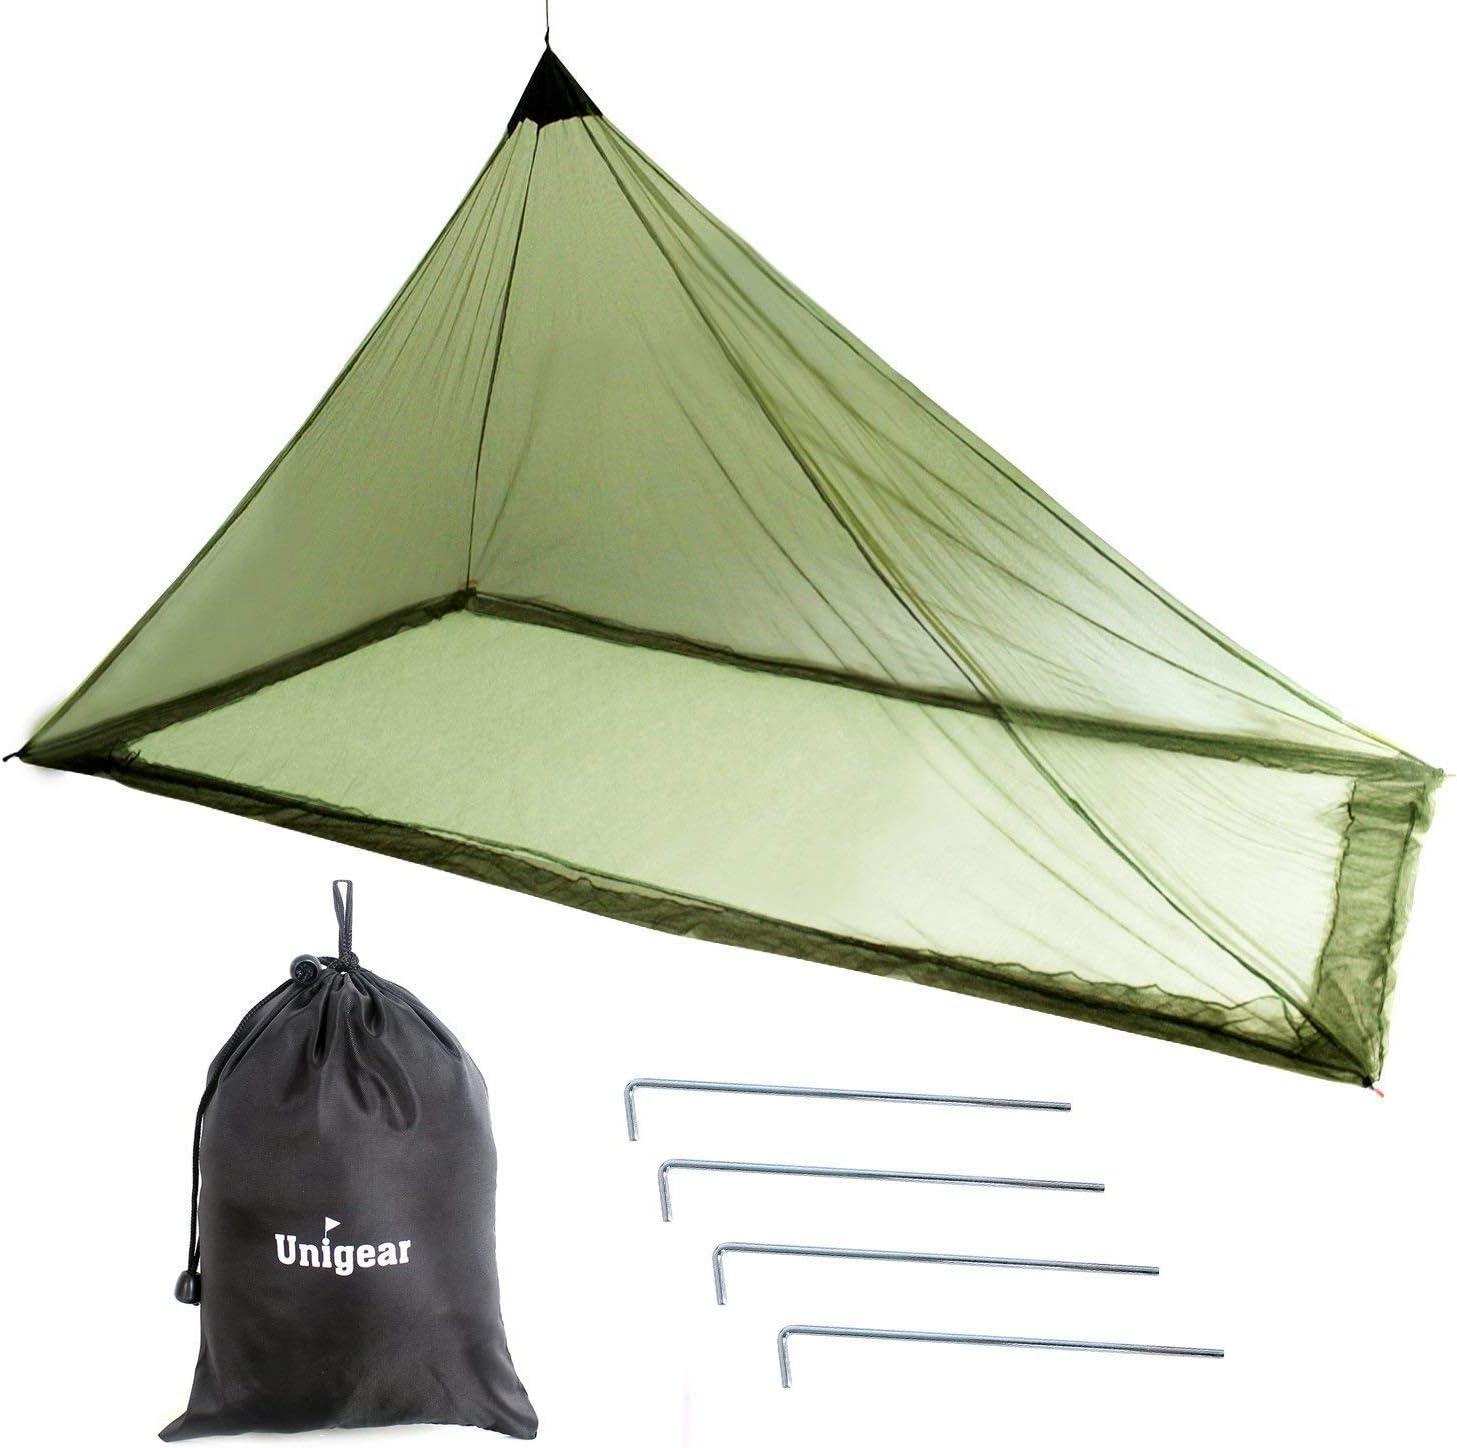 Unigear Mosquitera Camping Portátil 2 Personas para Acampa Campaña Hamaca Red Antimosquitos Mosquito Net 240X140X130CM (no disponible)